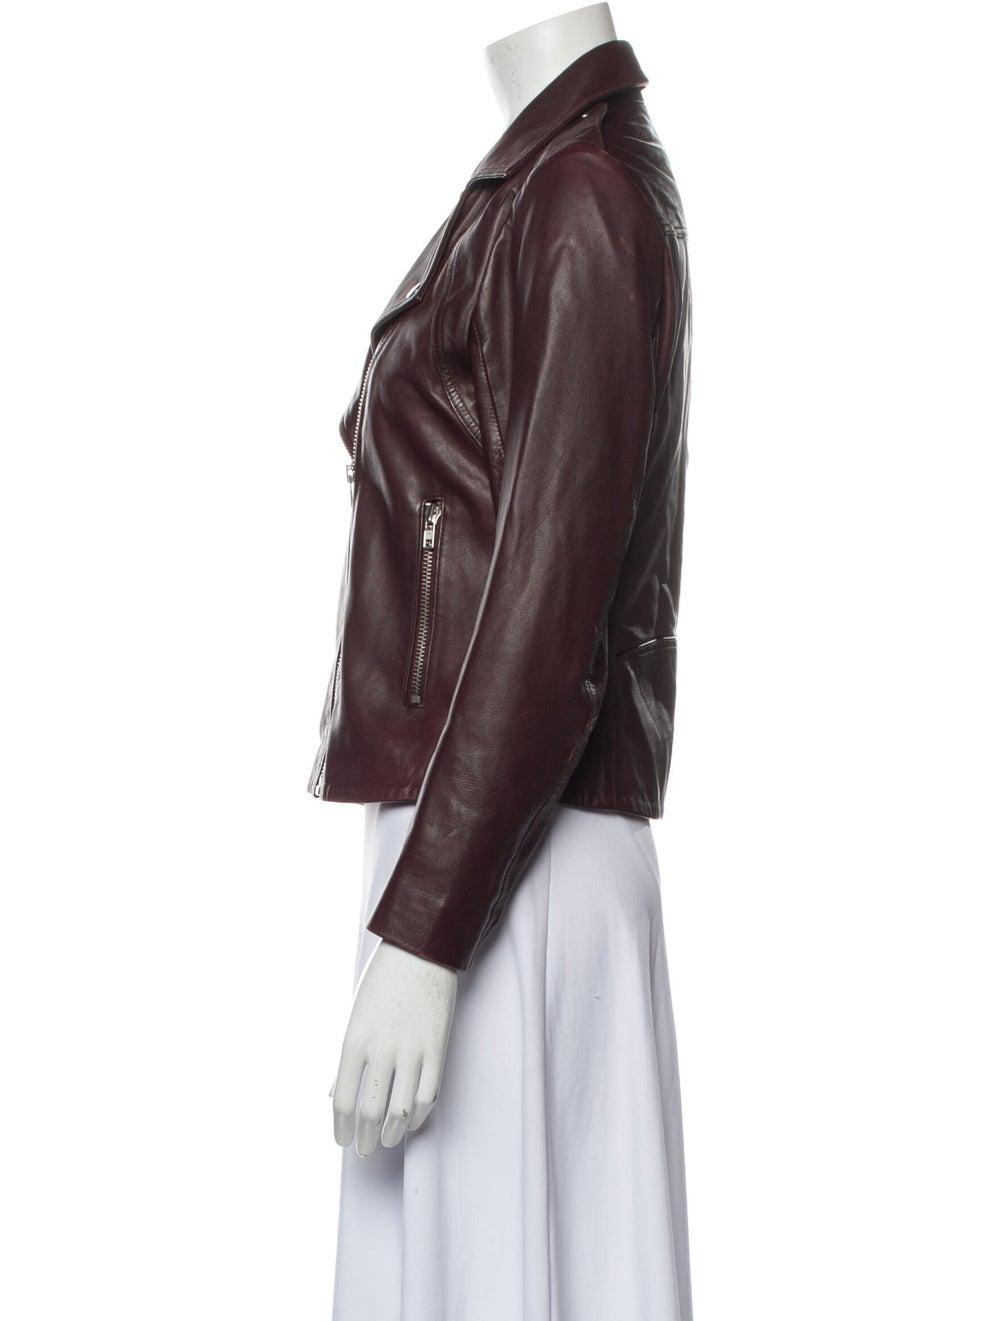 Sandro Lamb Leather Biker Jacket - image 2